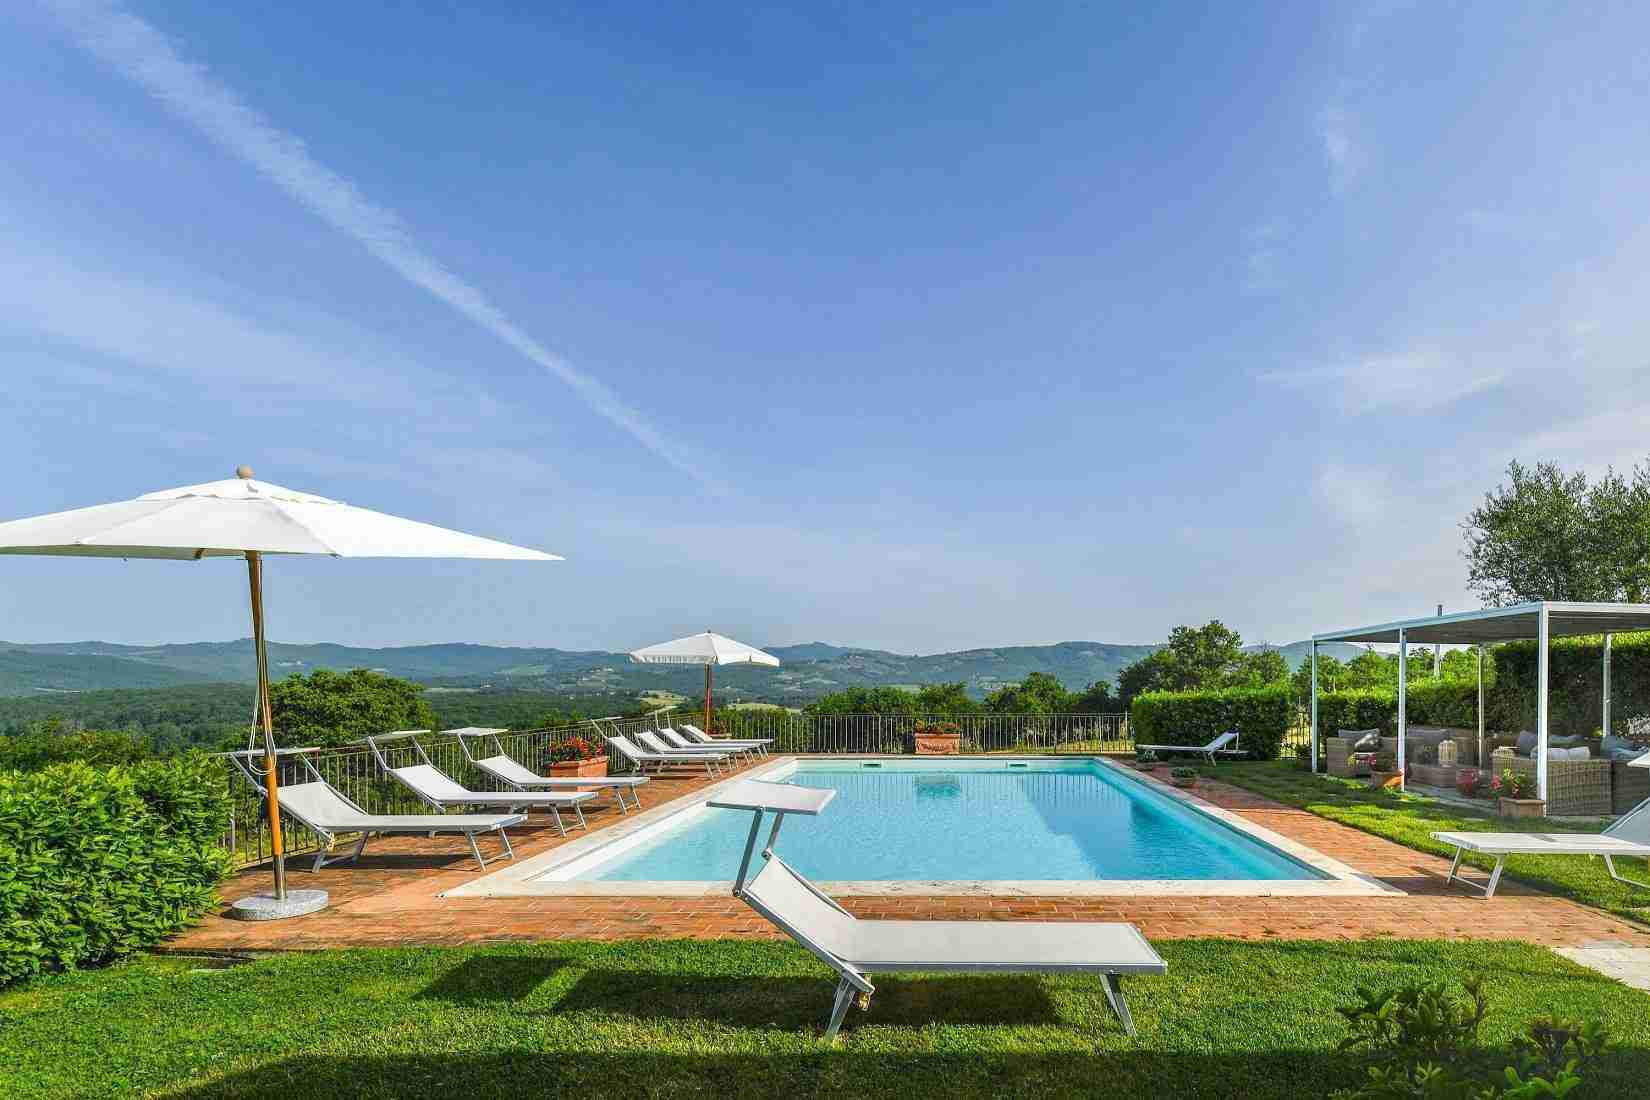 4 Fiorenza Pool